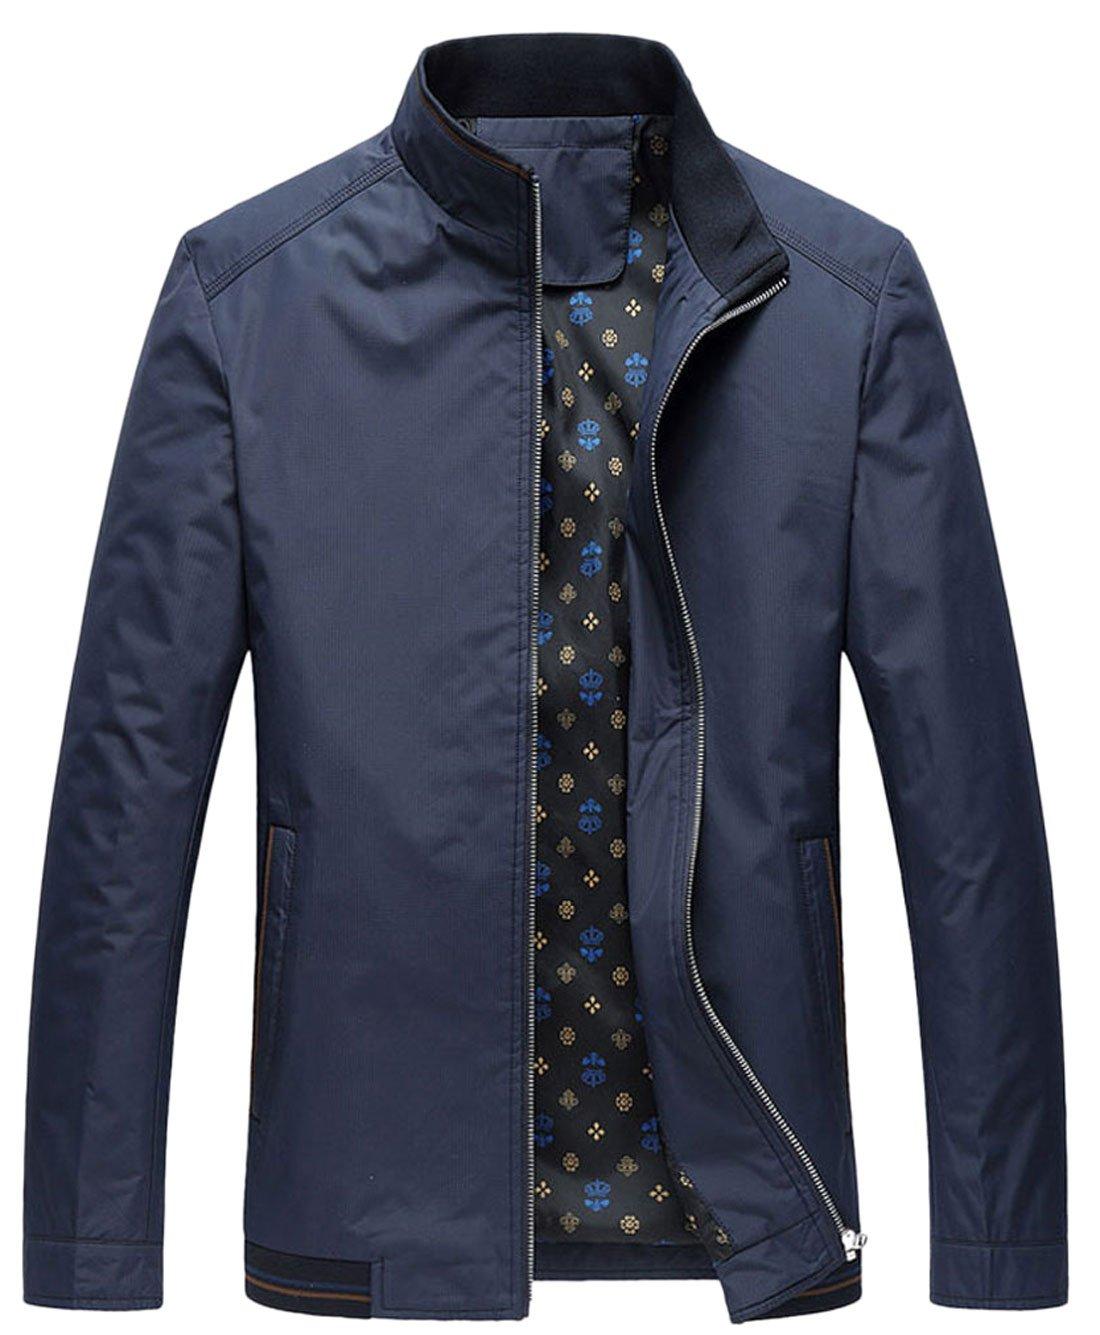 Chouyatou Mens Casual Softshell Full Zip Lightweight Bomber Jacket (X-Large, Dark Blue)